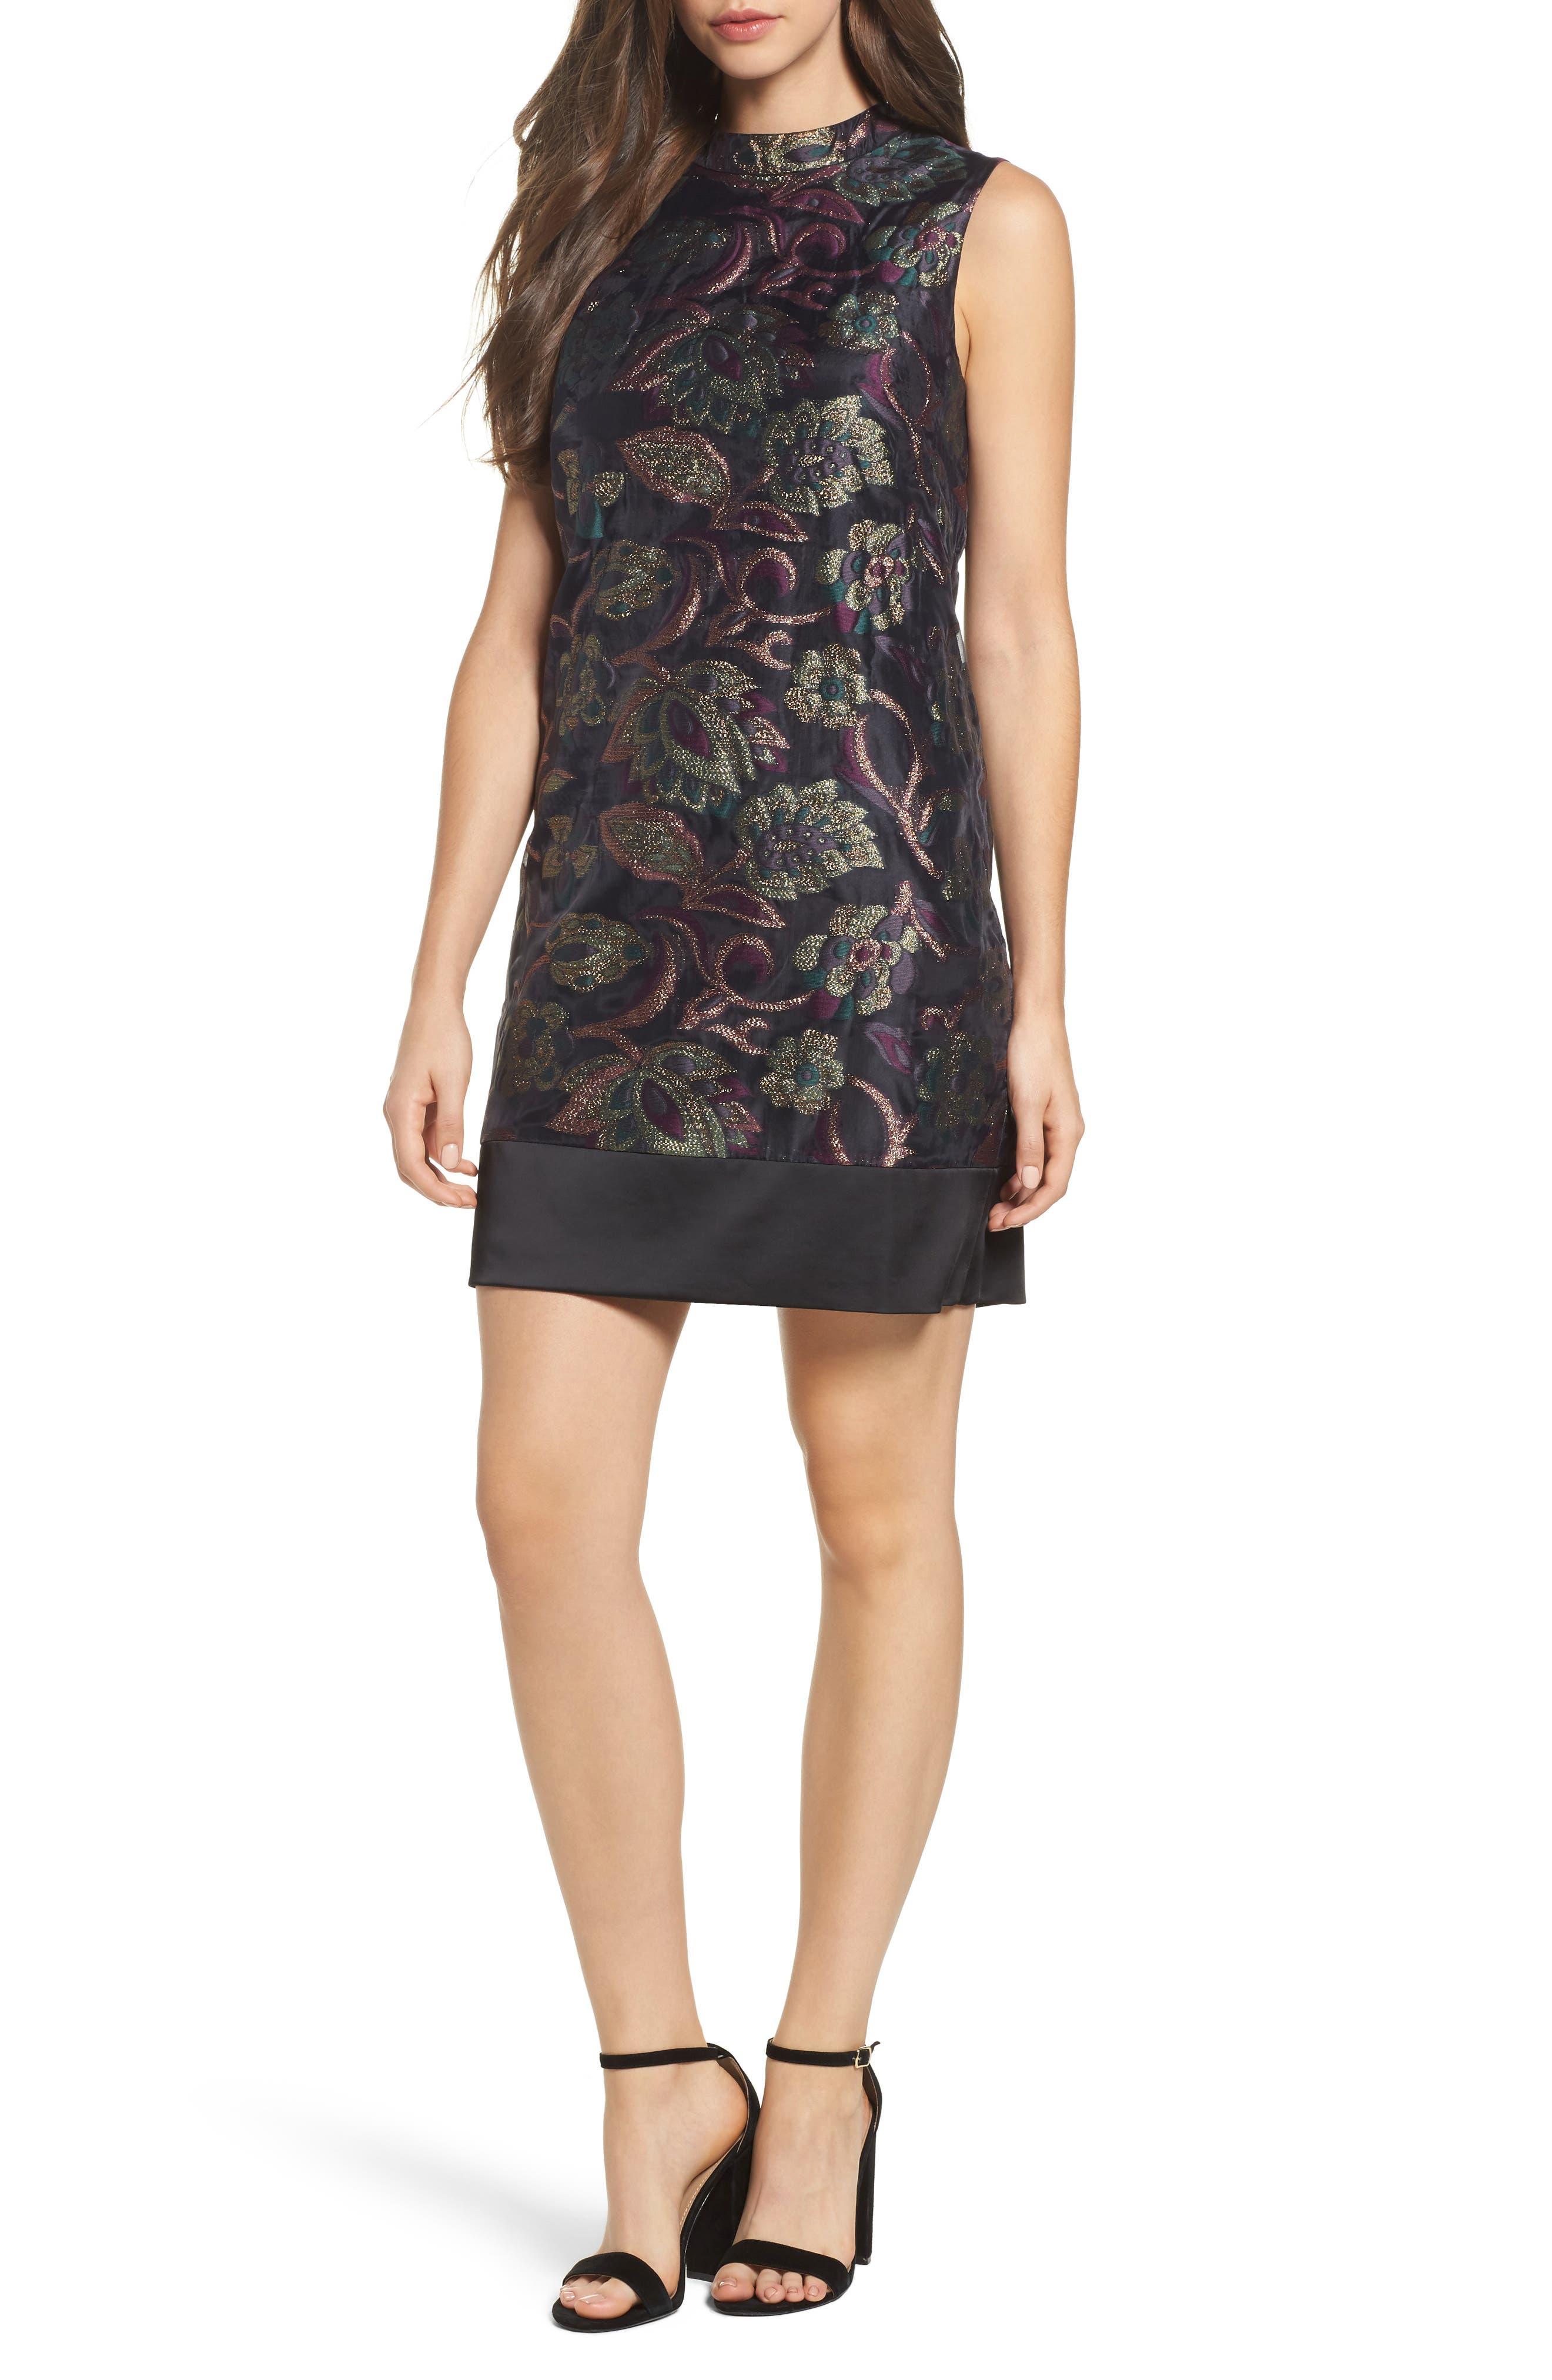 Alternate Image 1 Selected - Maggy London Jacquard Shift Dress (Regular & Petite)